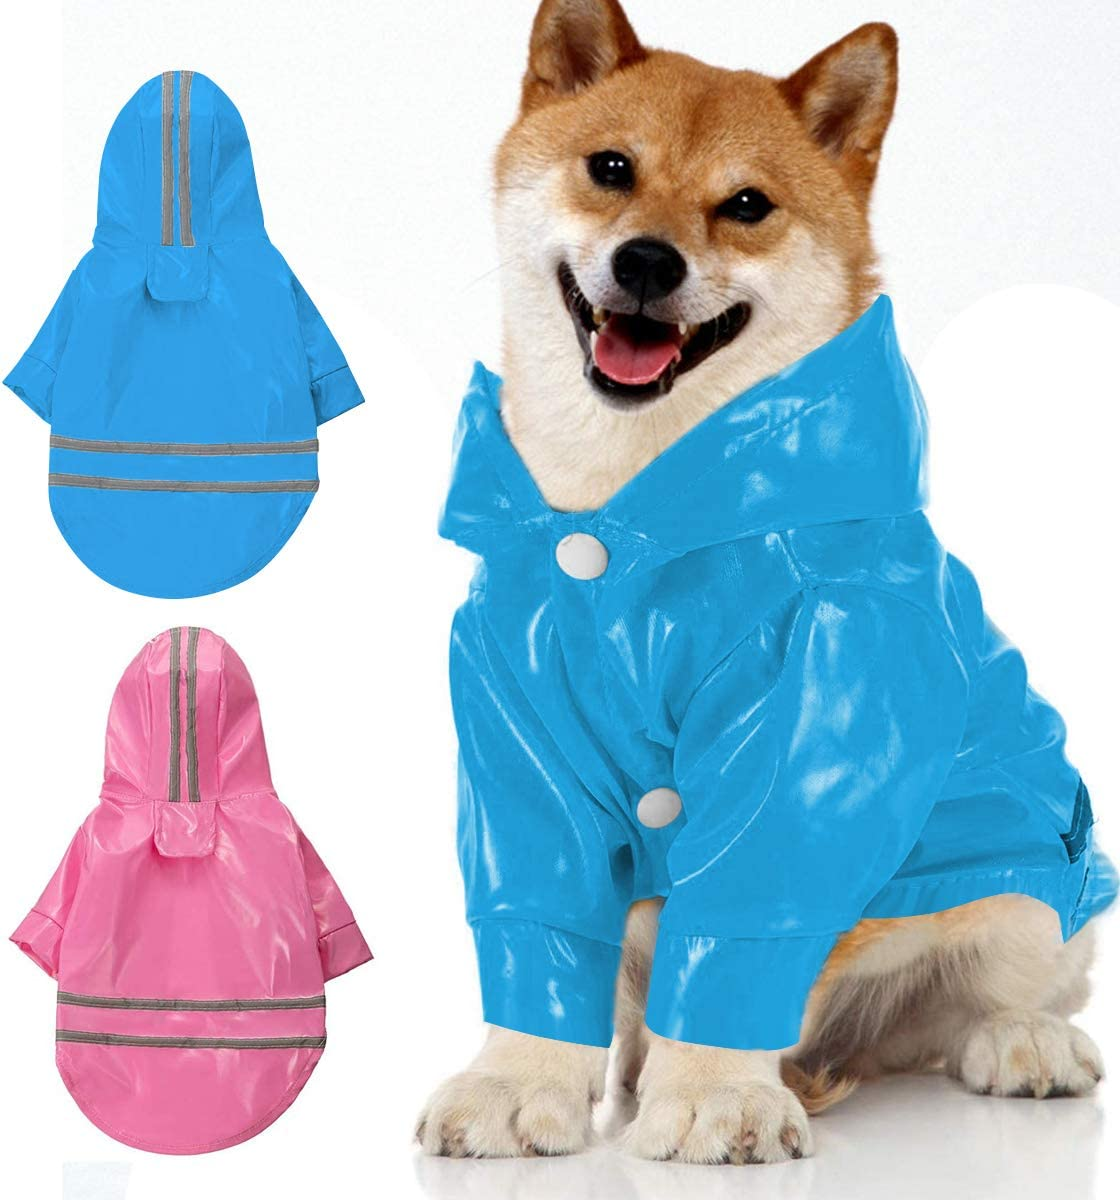 Vockvic 2 Piezas Chubasqueros para Perro, Cachorro de Lluvia para Mascotas al Aire Libre con Capucha Chaquetas Impermeables PU Impermeable Reflectante para Perros Gatos Ropa(Azul, Rojo)